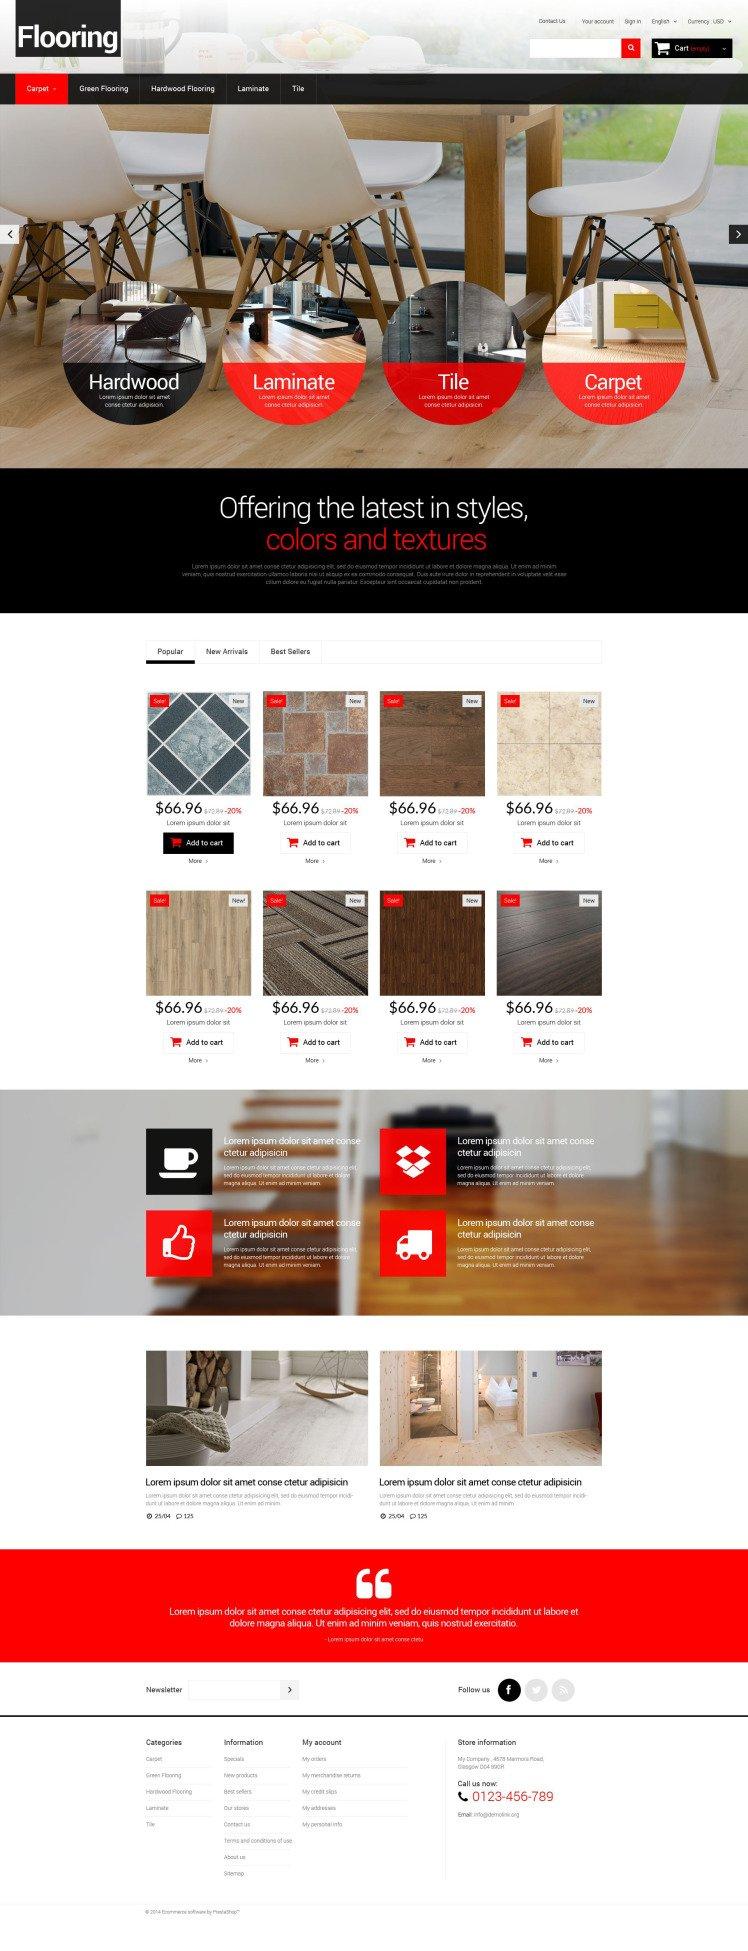 Flooring for Homes PrestaShop Themes